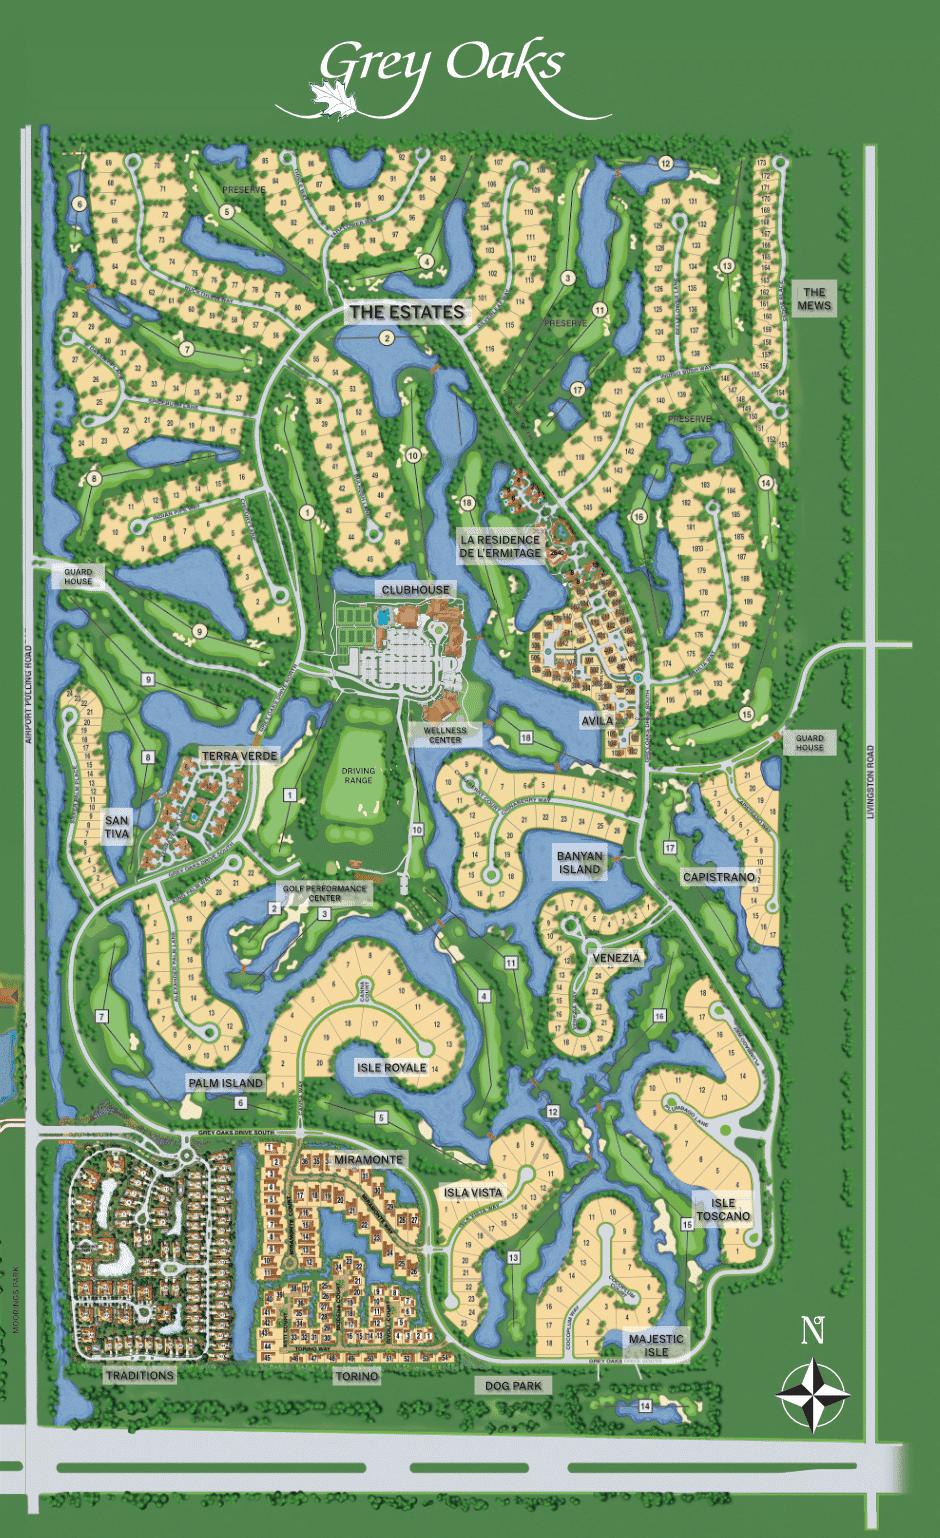 Grey Oaks site plan